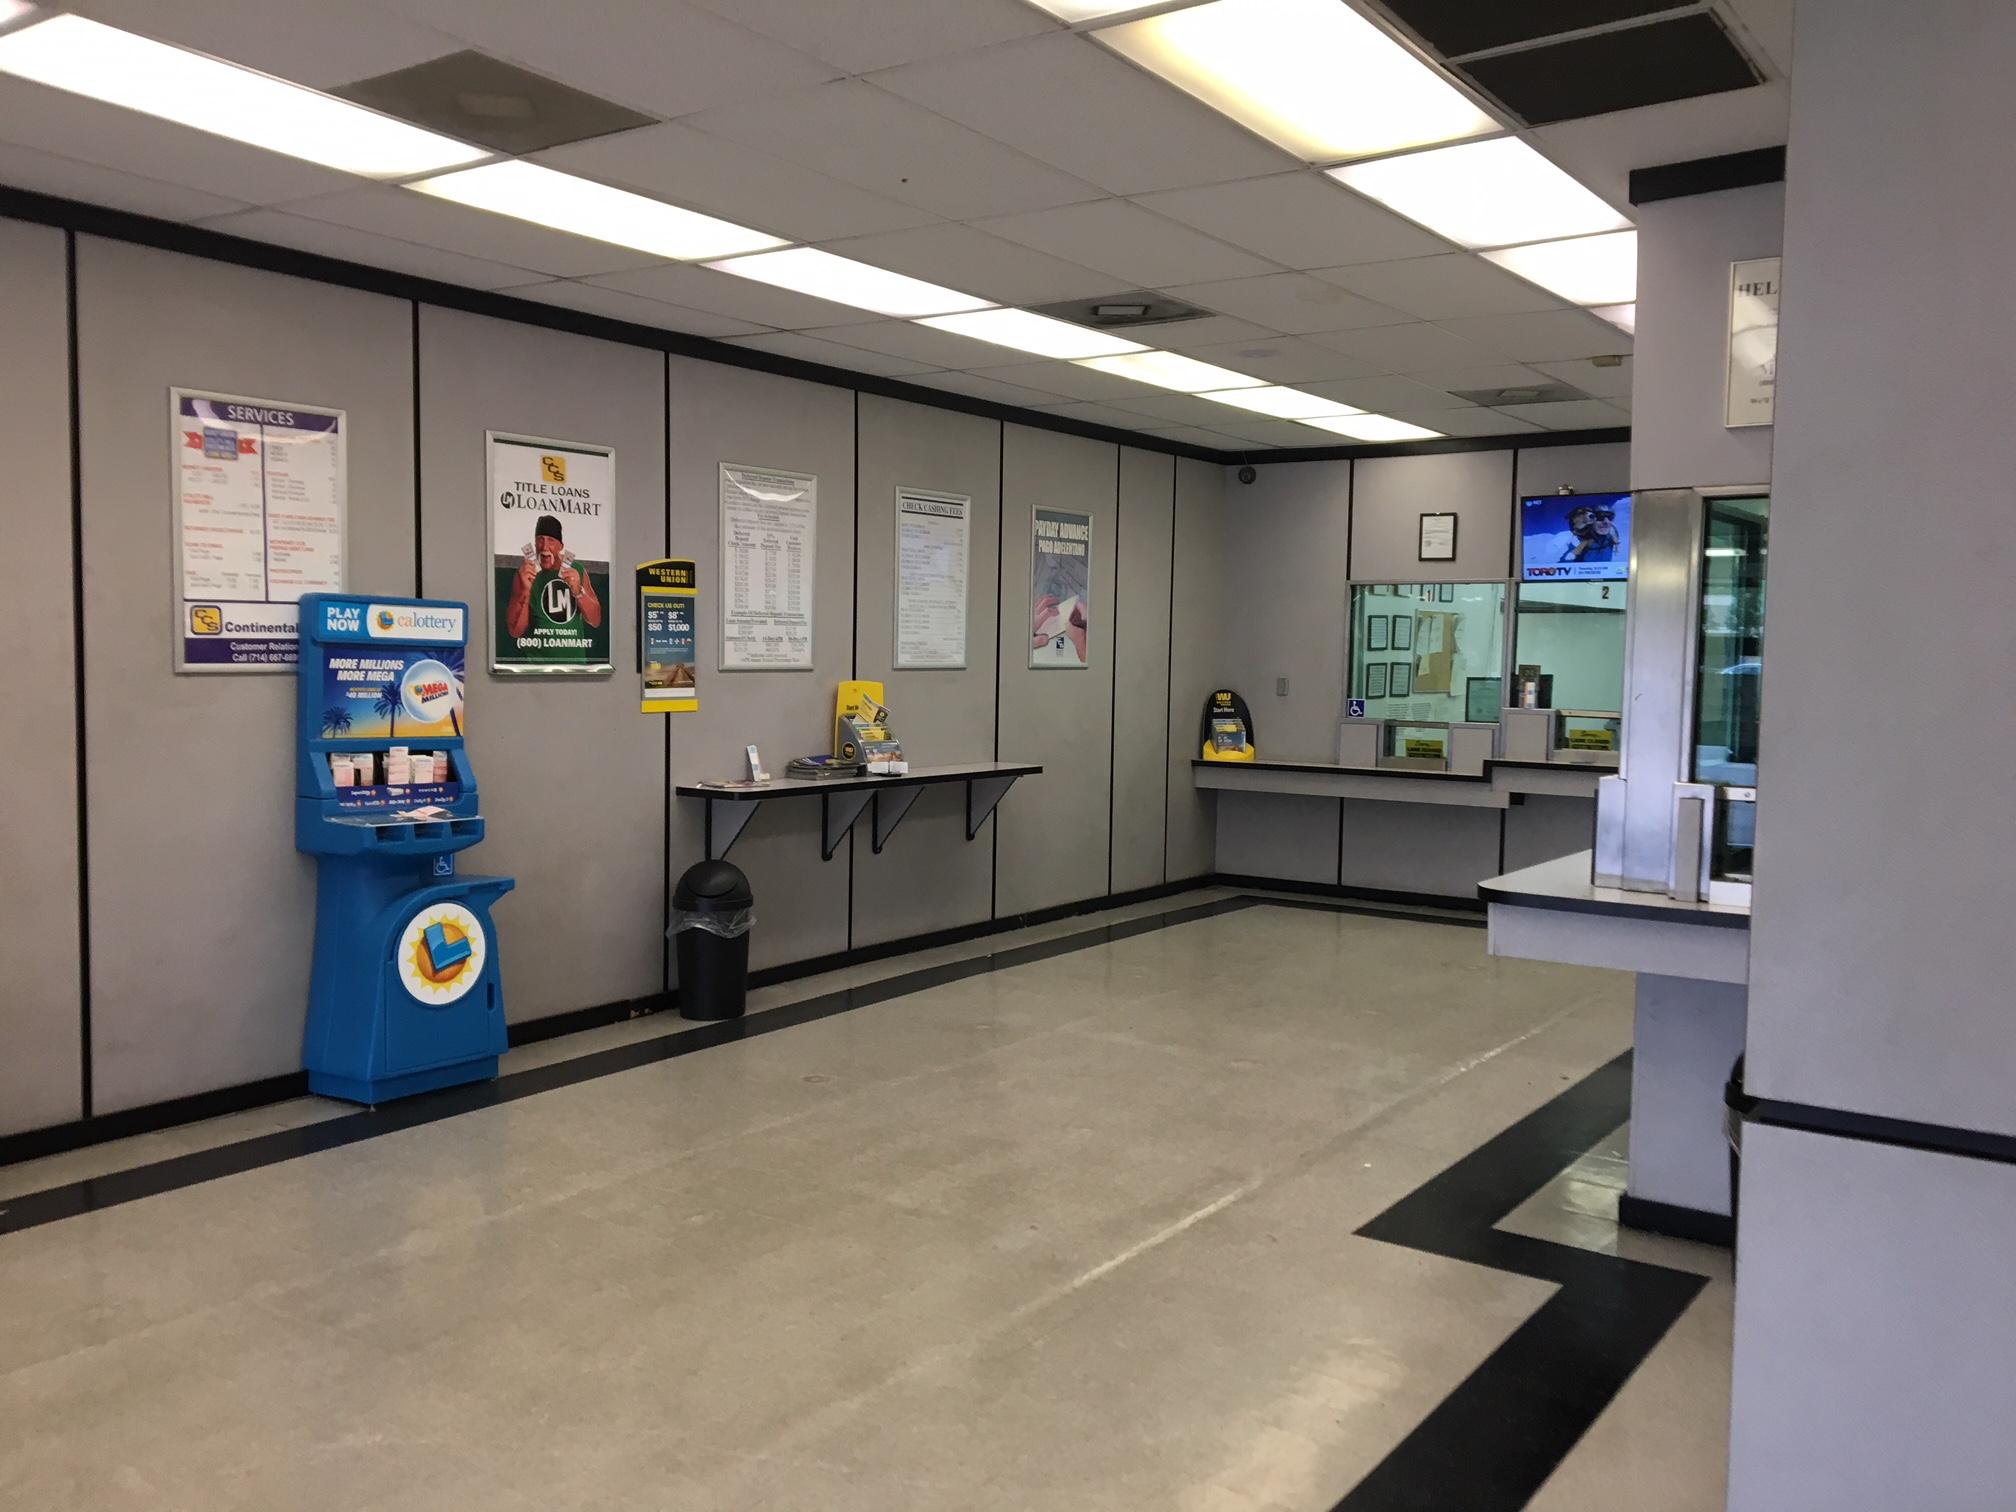 CCS Title Loans - LoanMart Pasadena